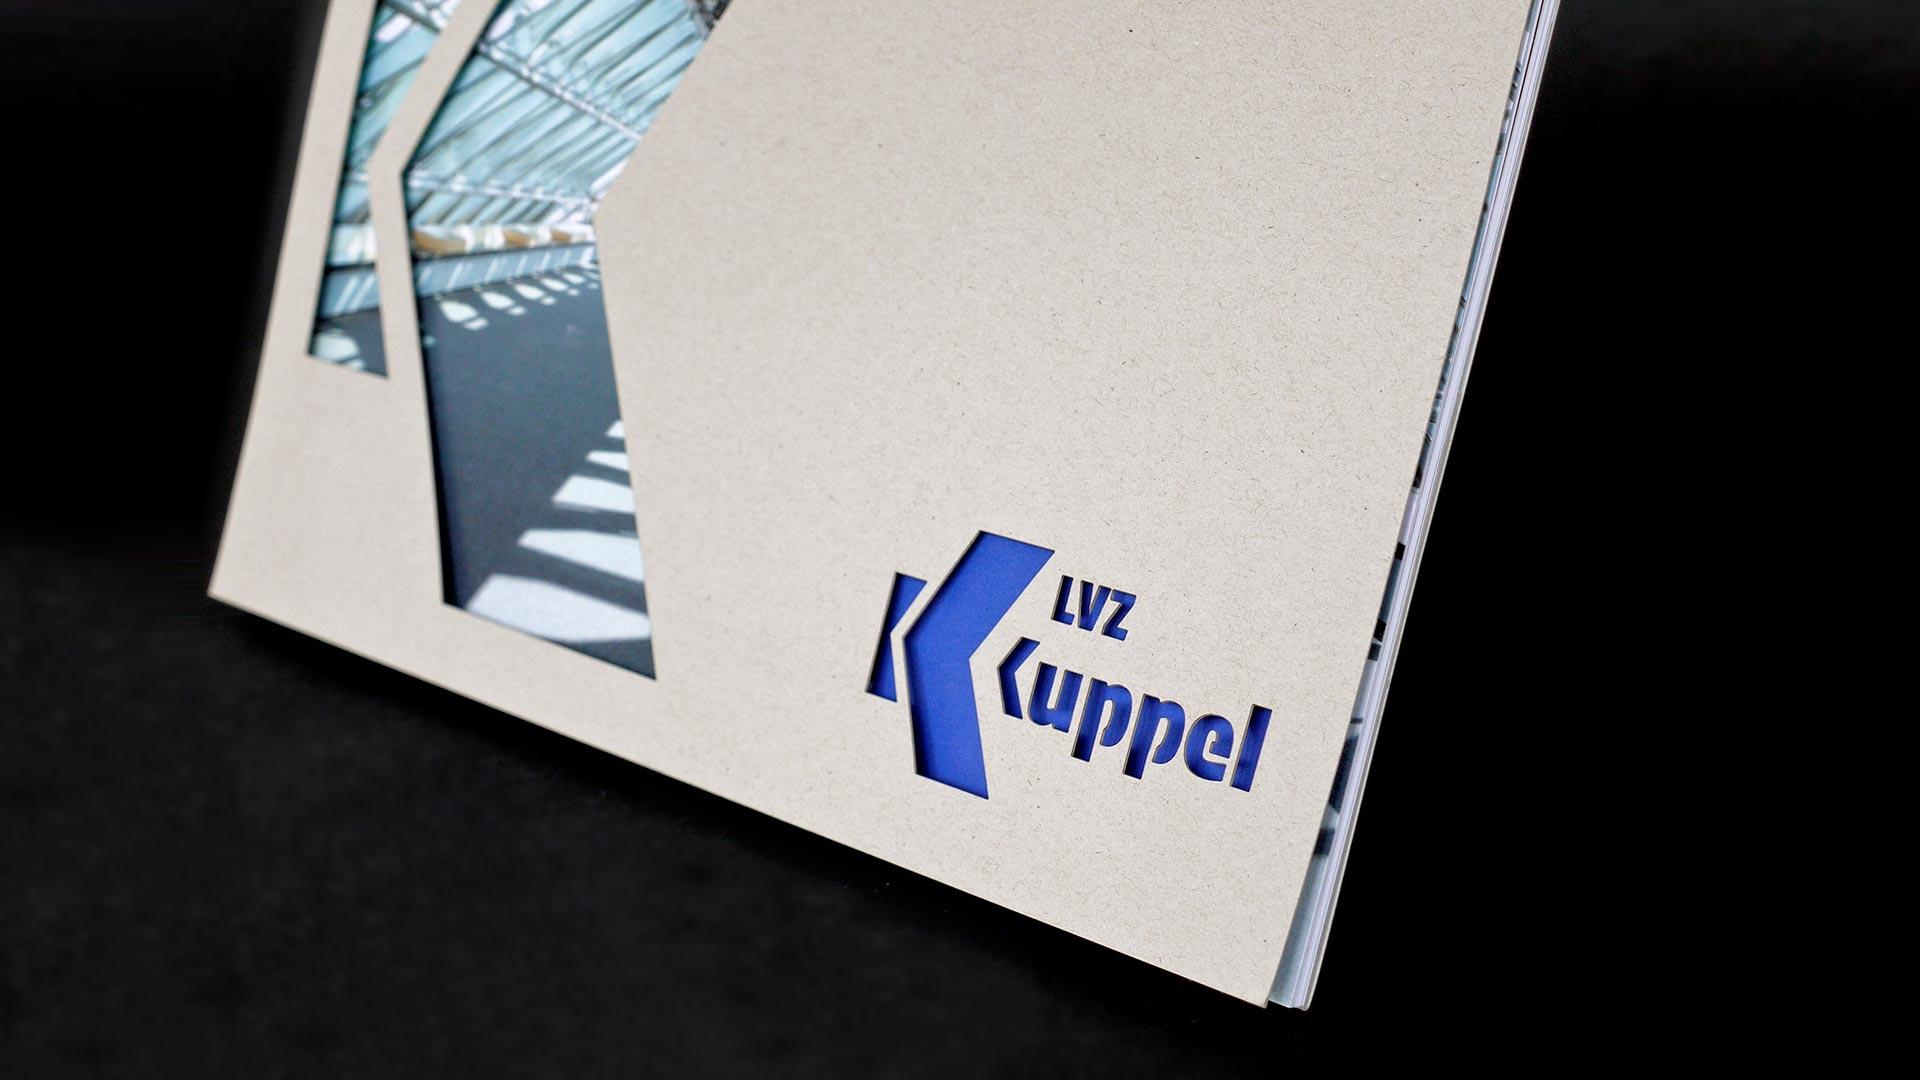 thomasdruck-lvz-kuppel__1130533-1 ThomasDruck - Referenzen- LVZ Kuppel